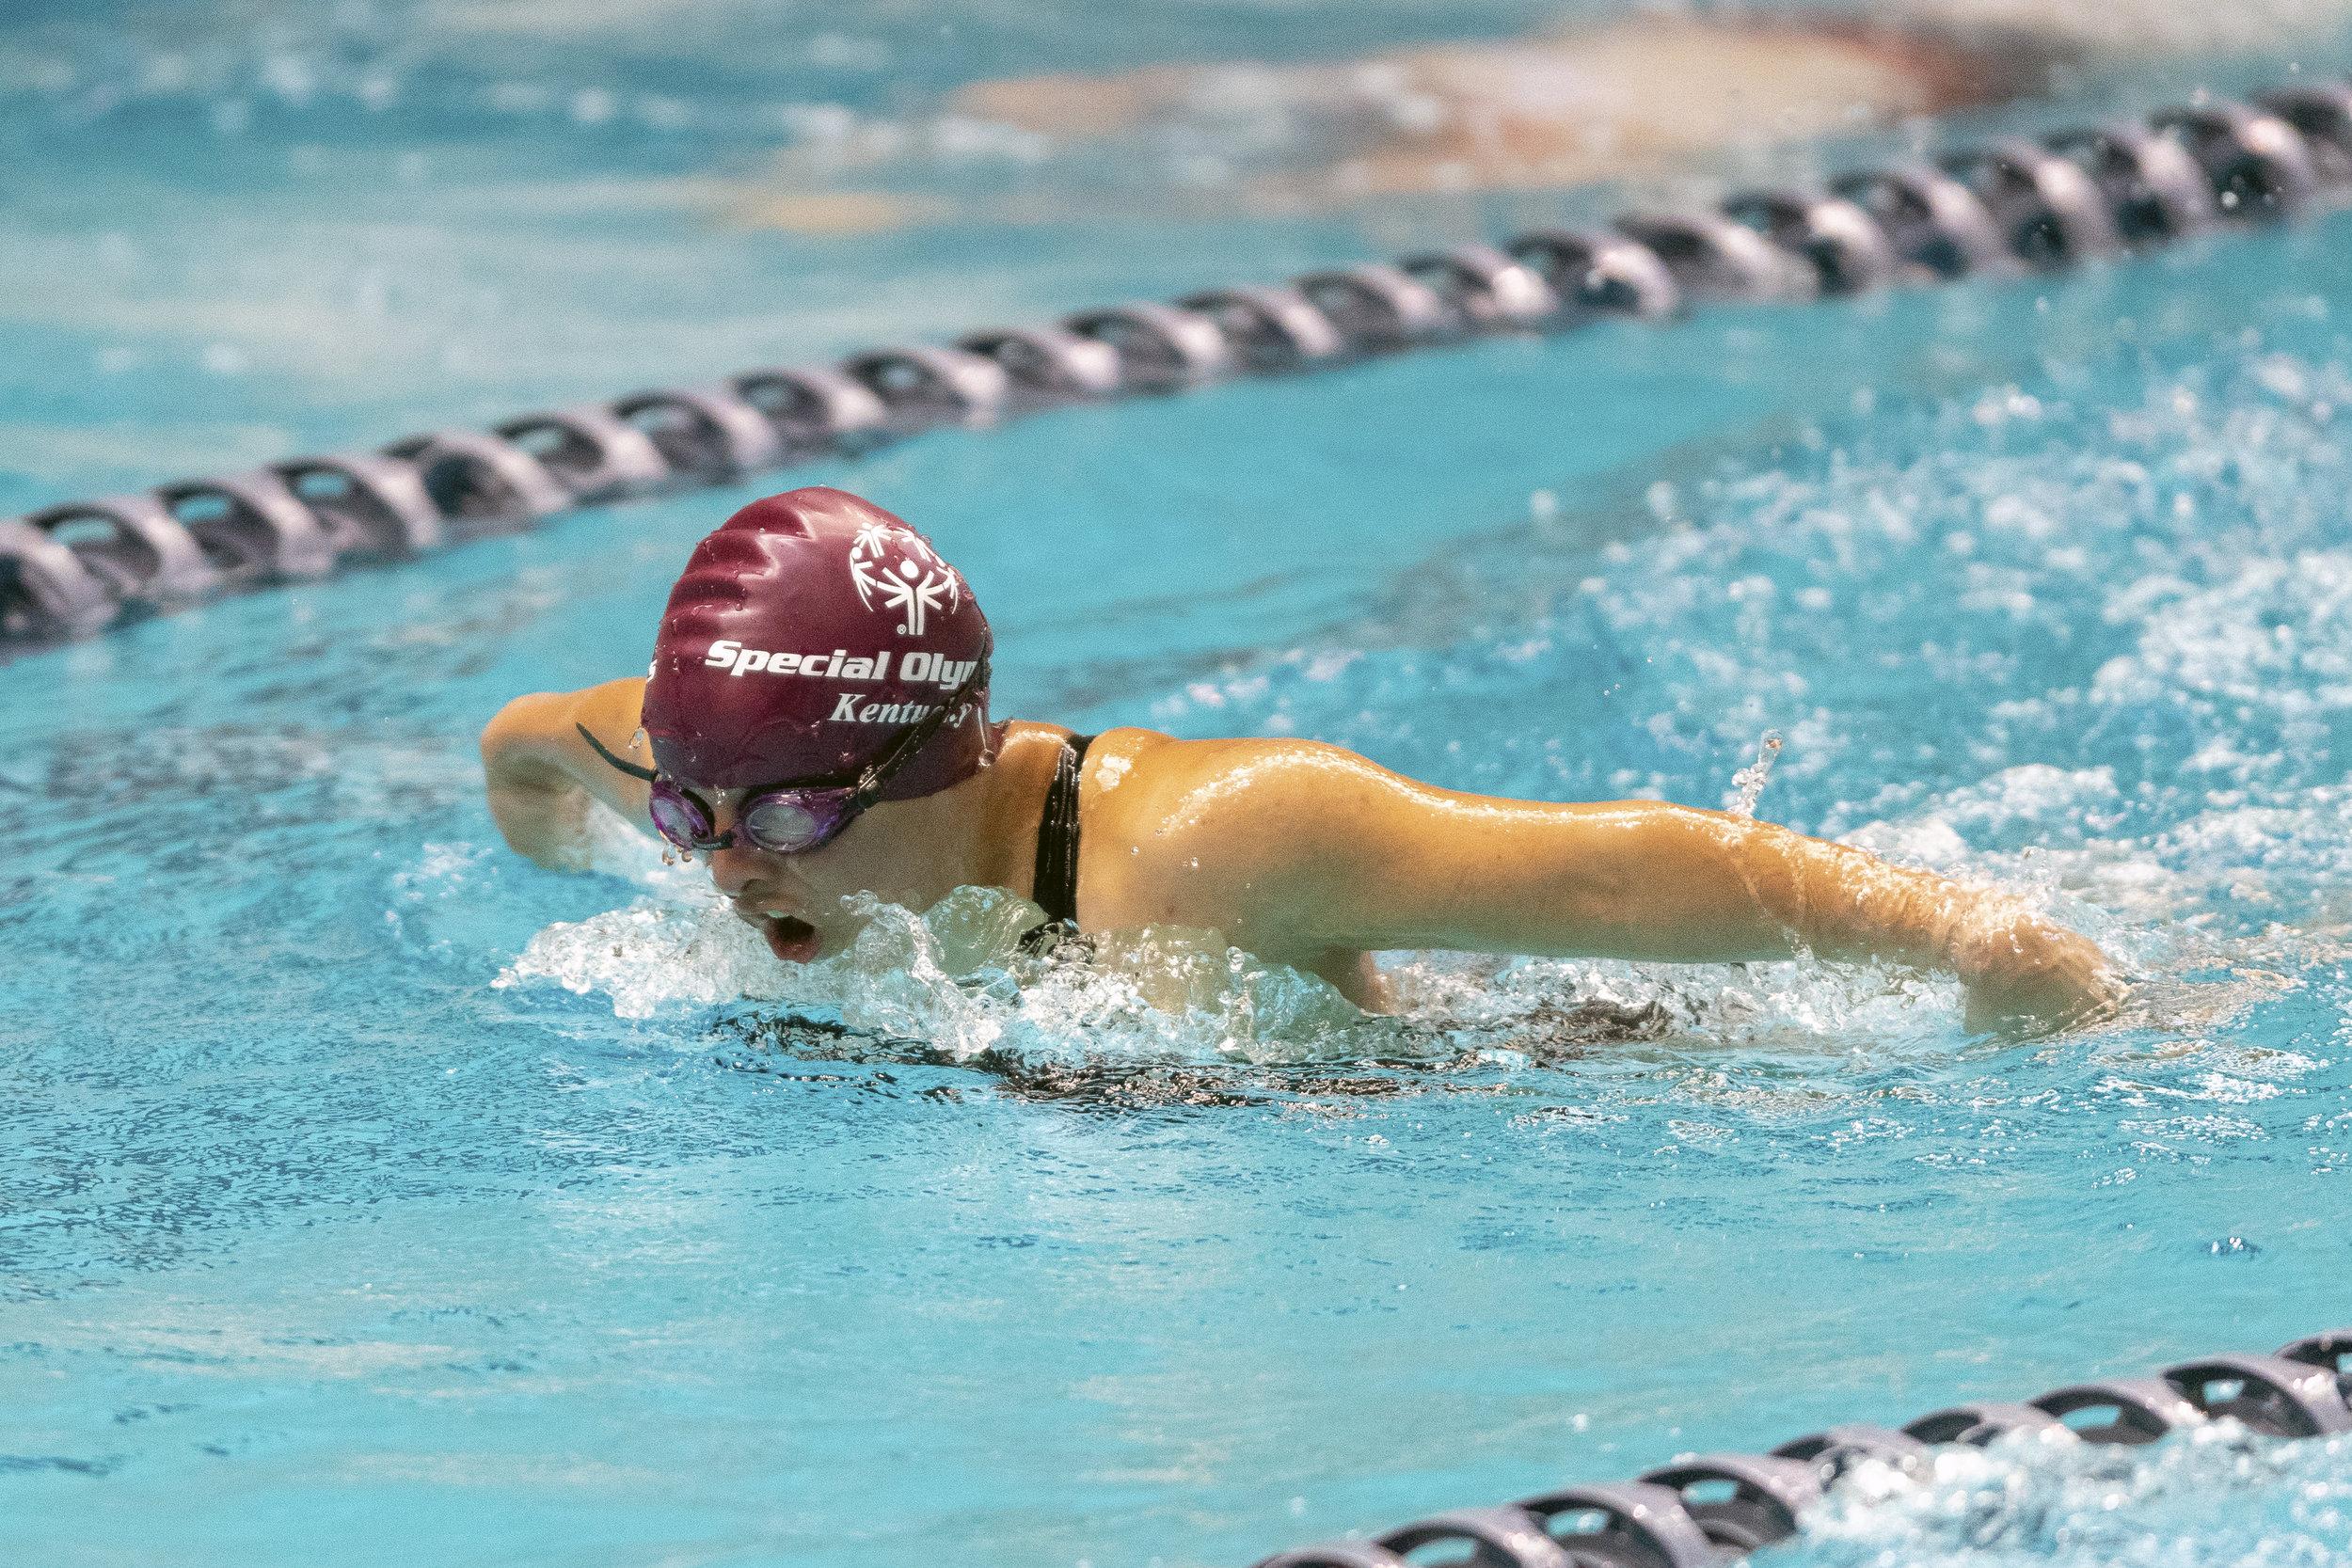 2018 USA Special Olympics Games: Swimming at the King County Aquatic Center in Federal Way, Washington.  Photo: Alika Jenner